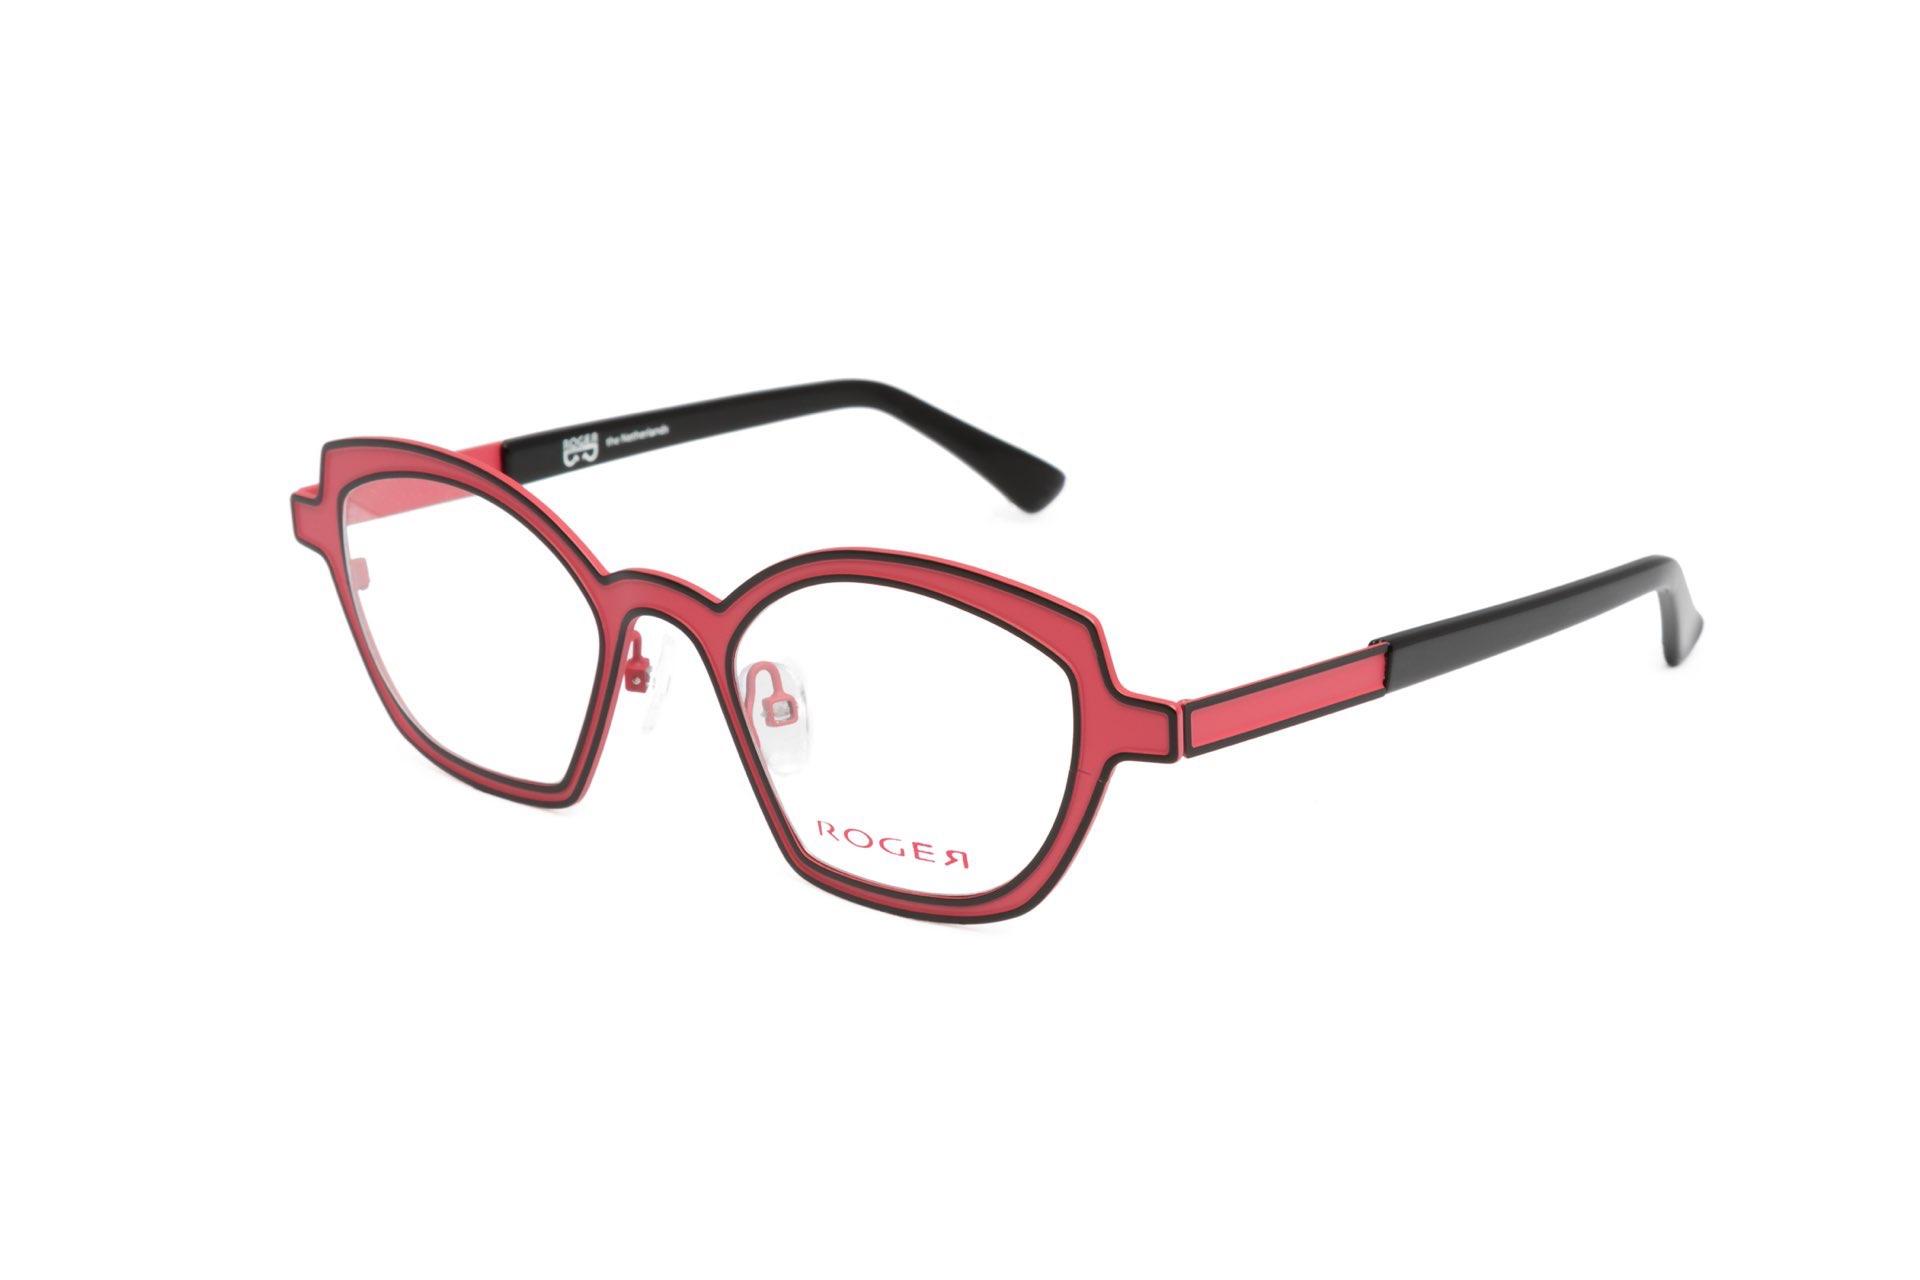 Roger Eyewear Design Glasses Boca Raton New Look Eye Wear